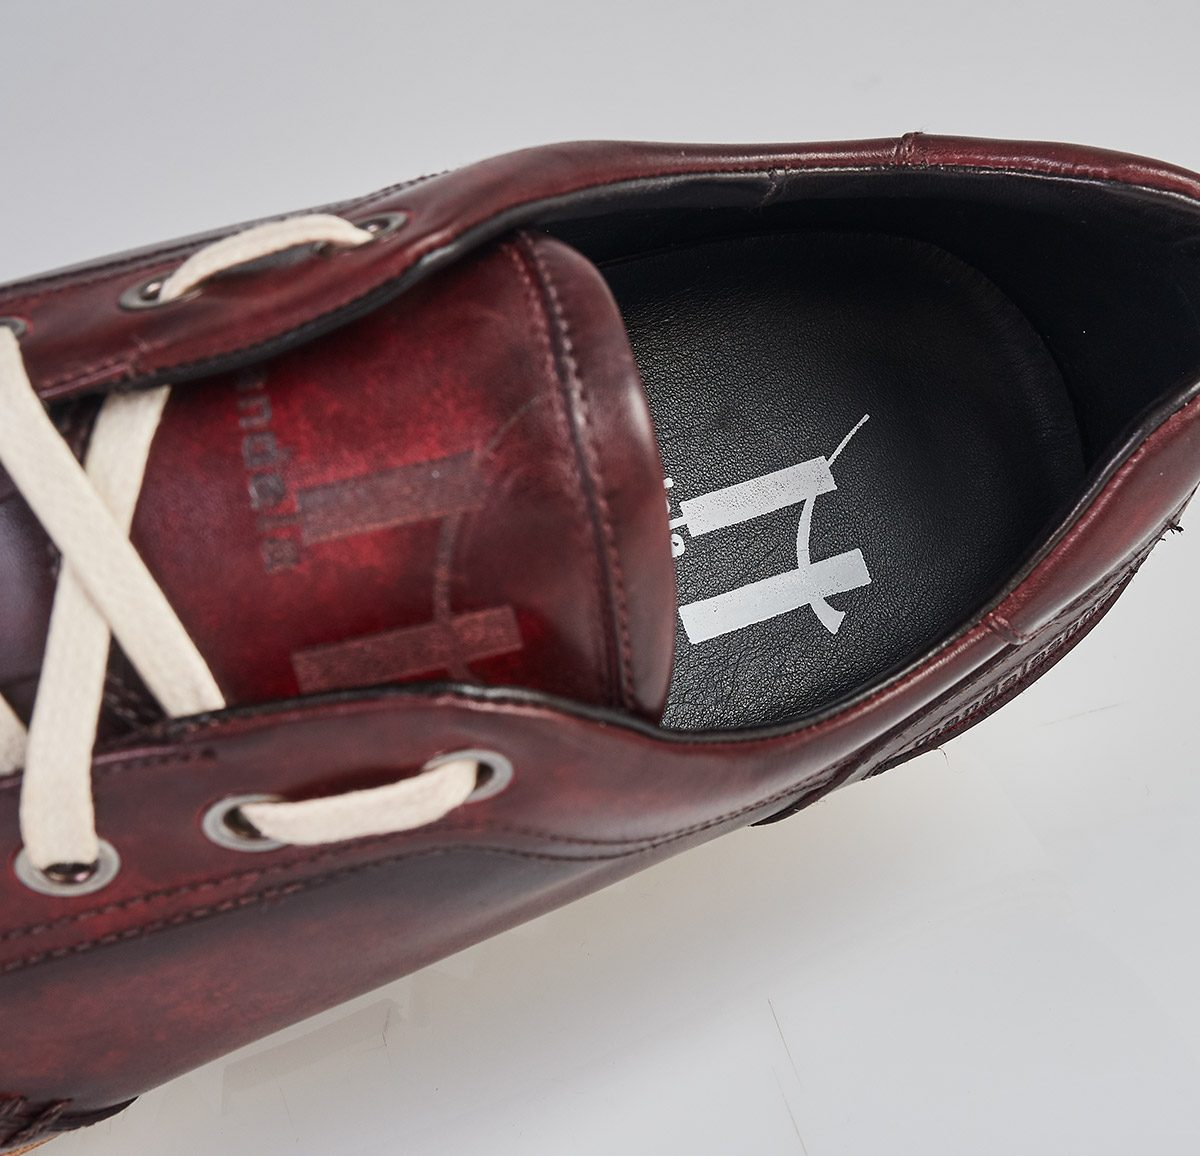 Zapato sneaker patina bordeau hecho a mano en Mandalashoes. Hand made shoes. Schuhe nach mass